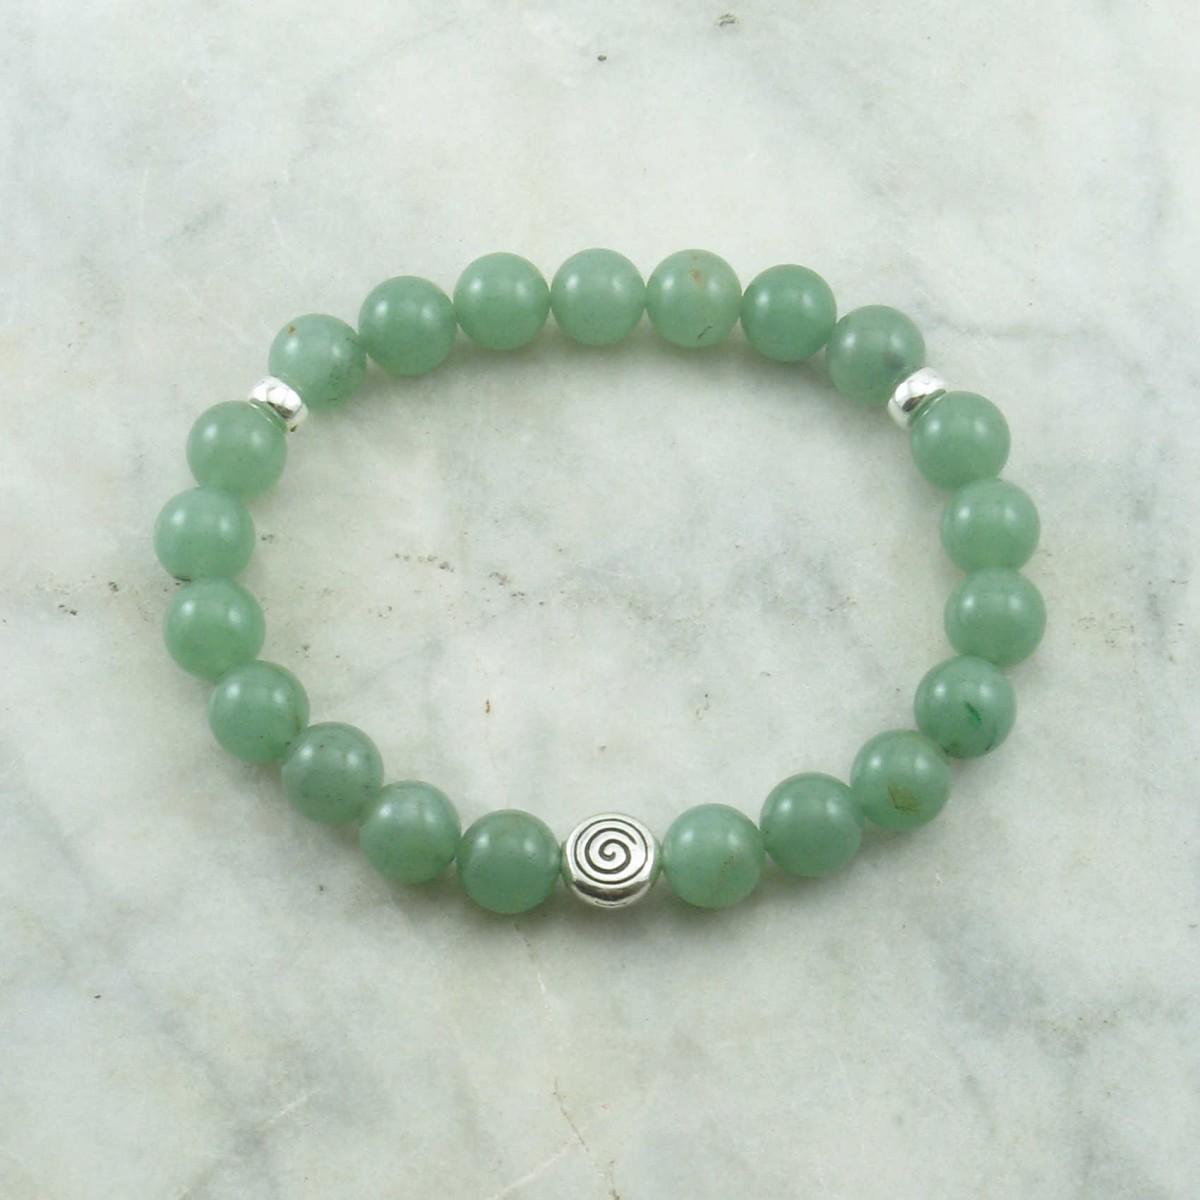 Life_Green_Aventurine_Mala_Beads_Mala_Bracelet